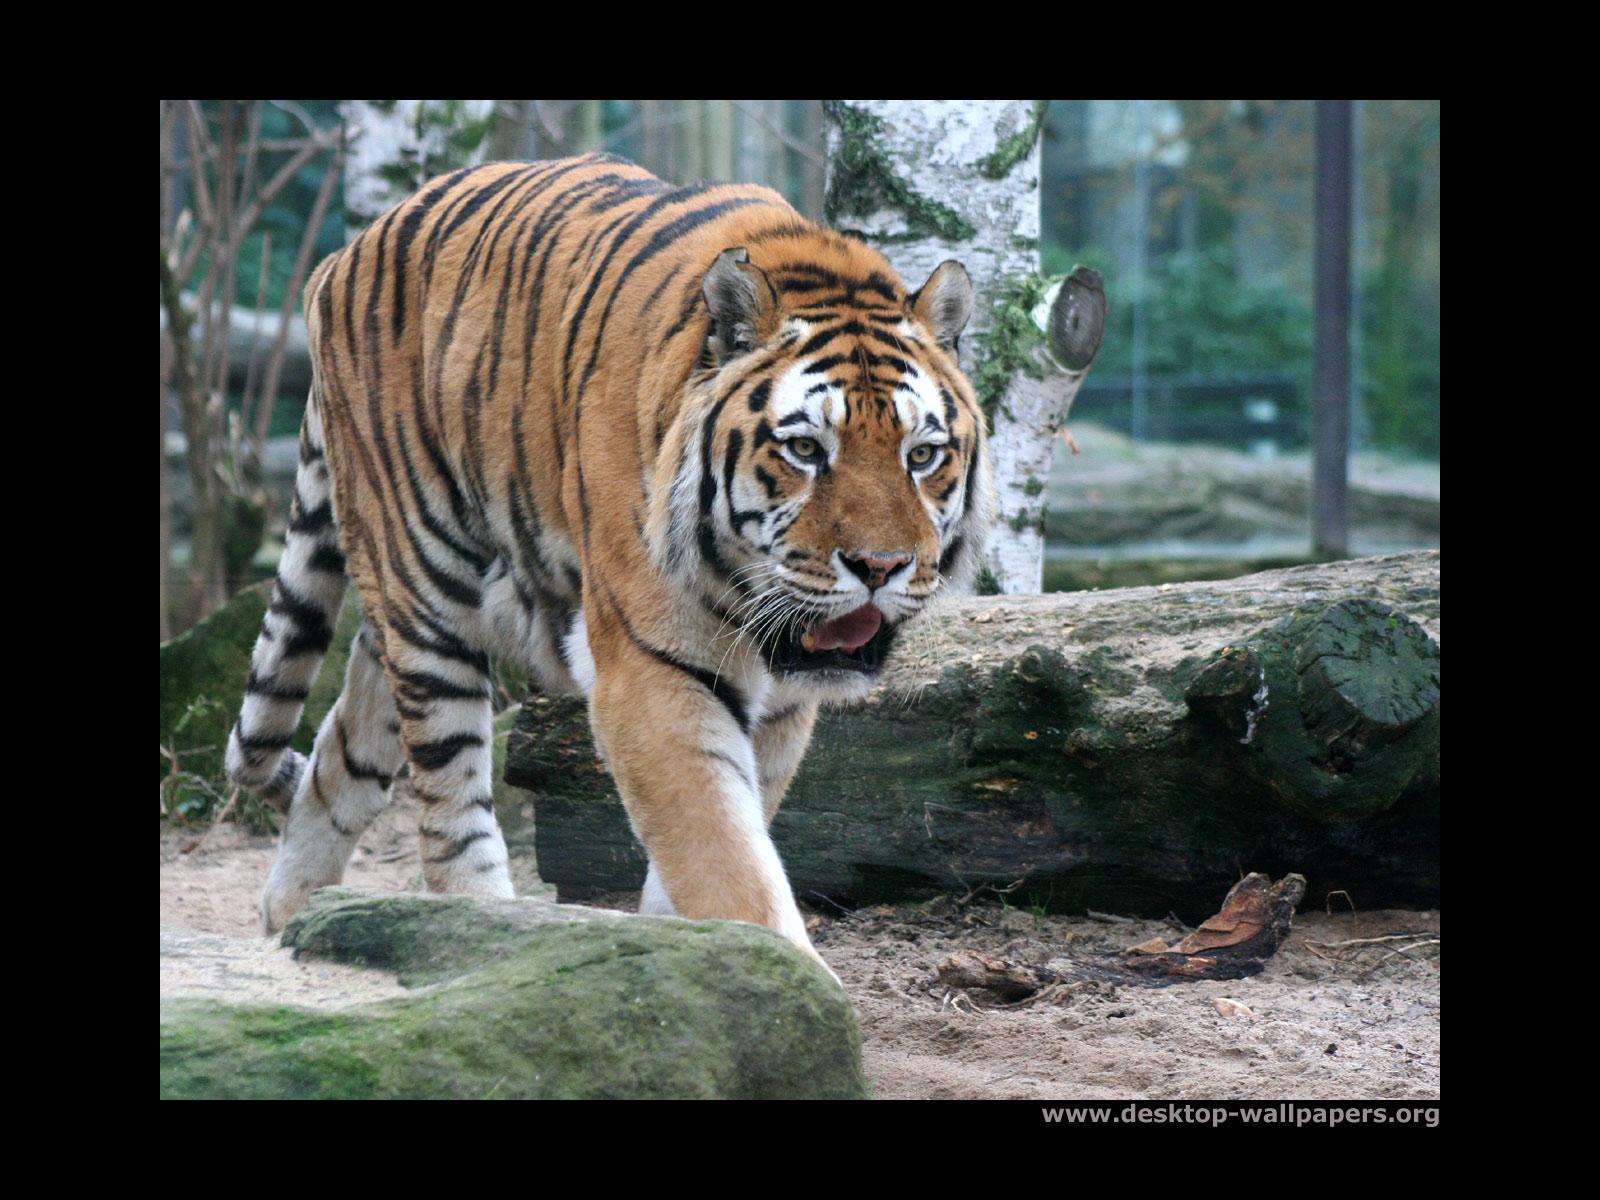 Wild Animals Tigers On Desktop Other Siberian Tiger Walk 357877 Wallpaper wallpaper